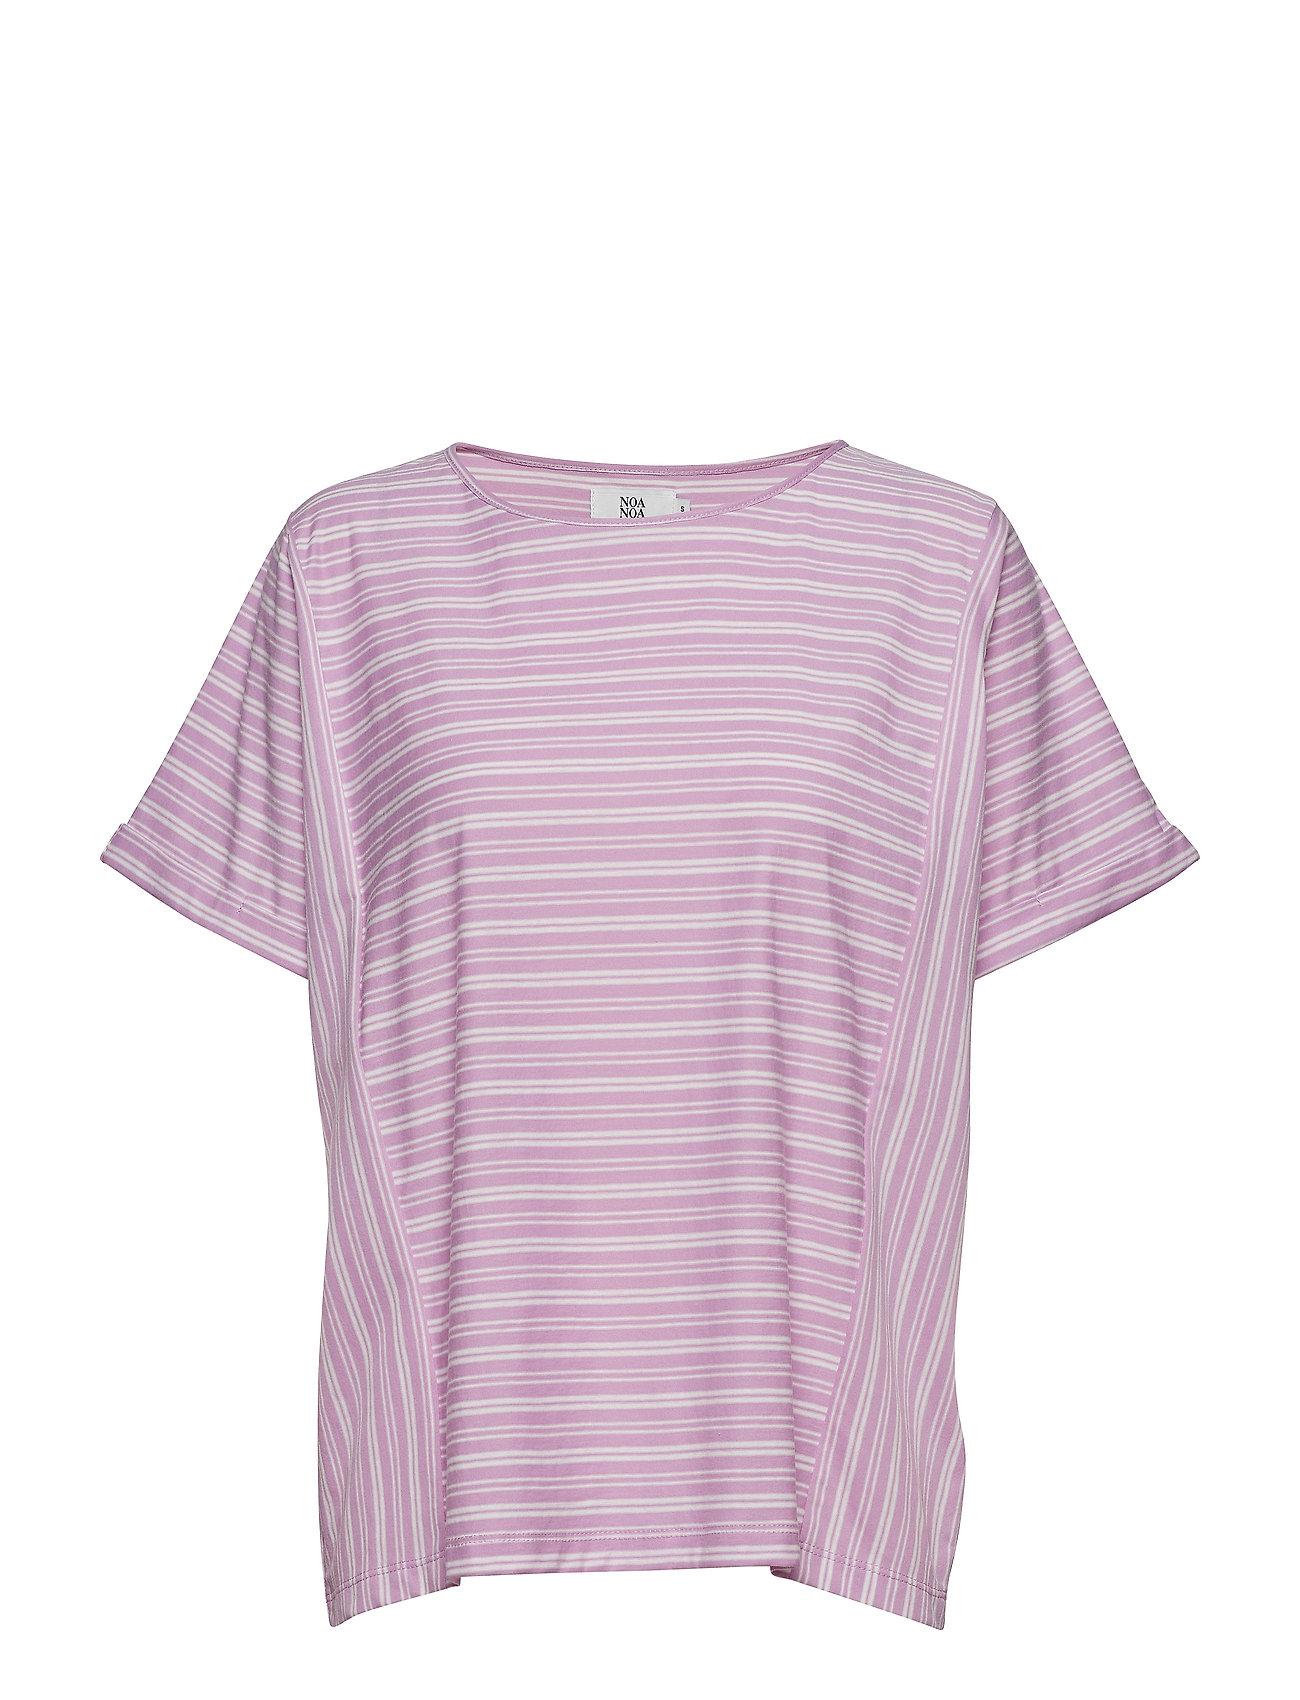 shirtart shirtart PurpleNoa T T T PurpleNoa DIeYEH2bW9